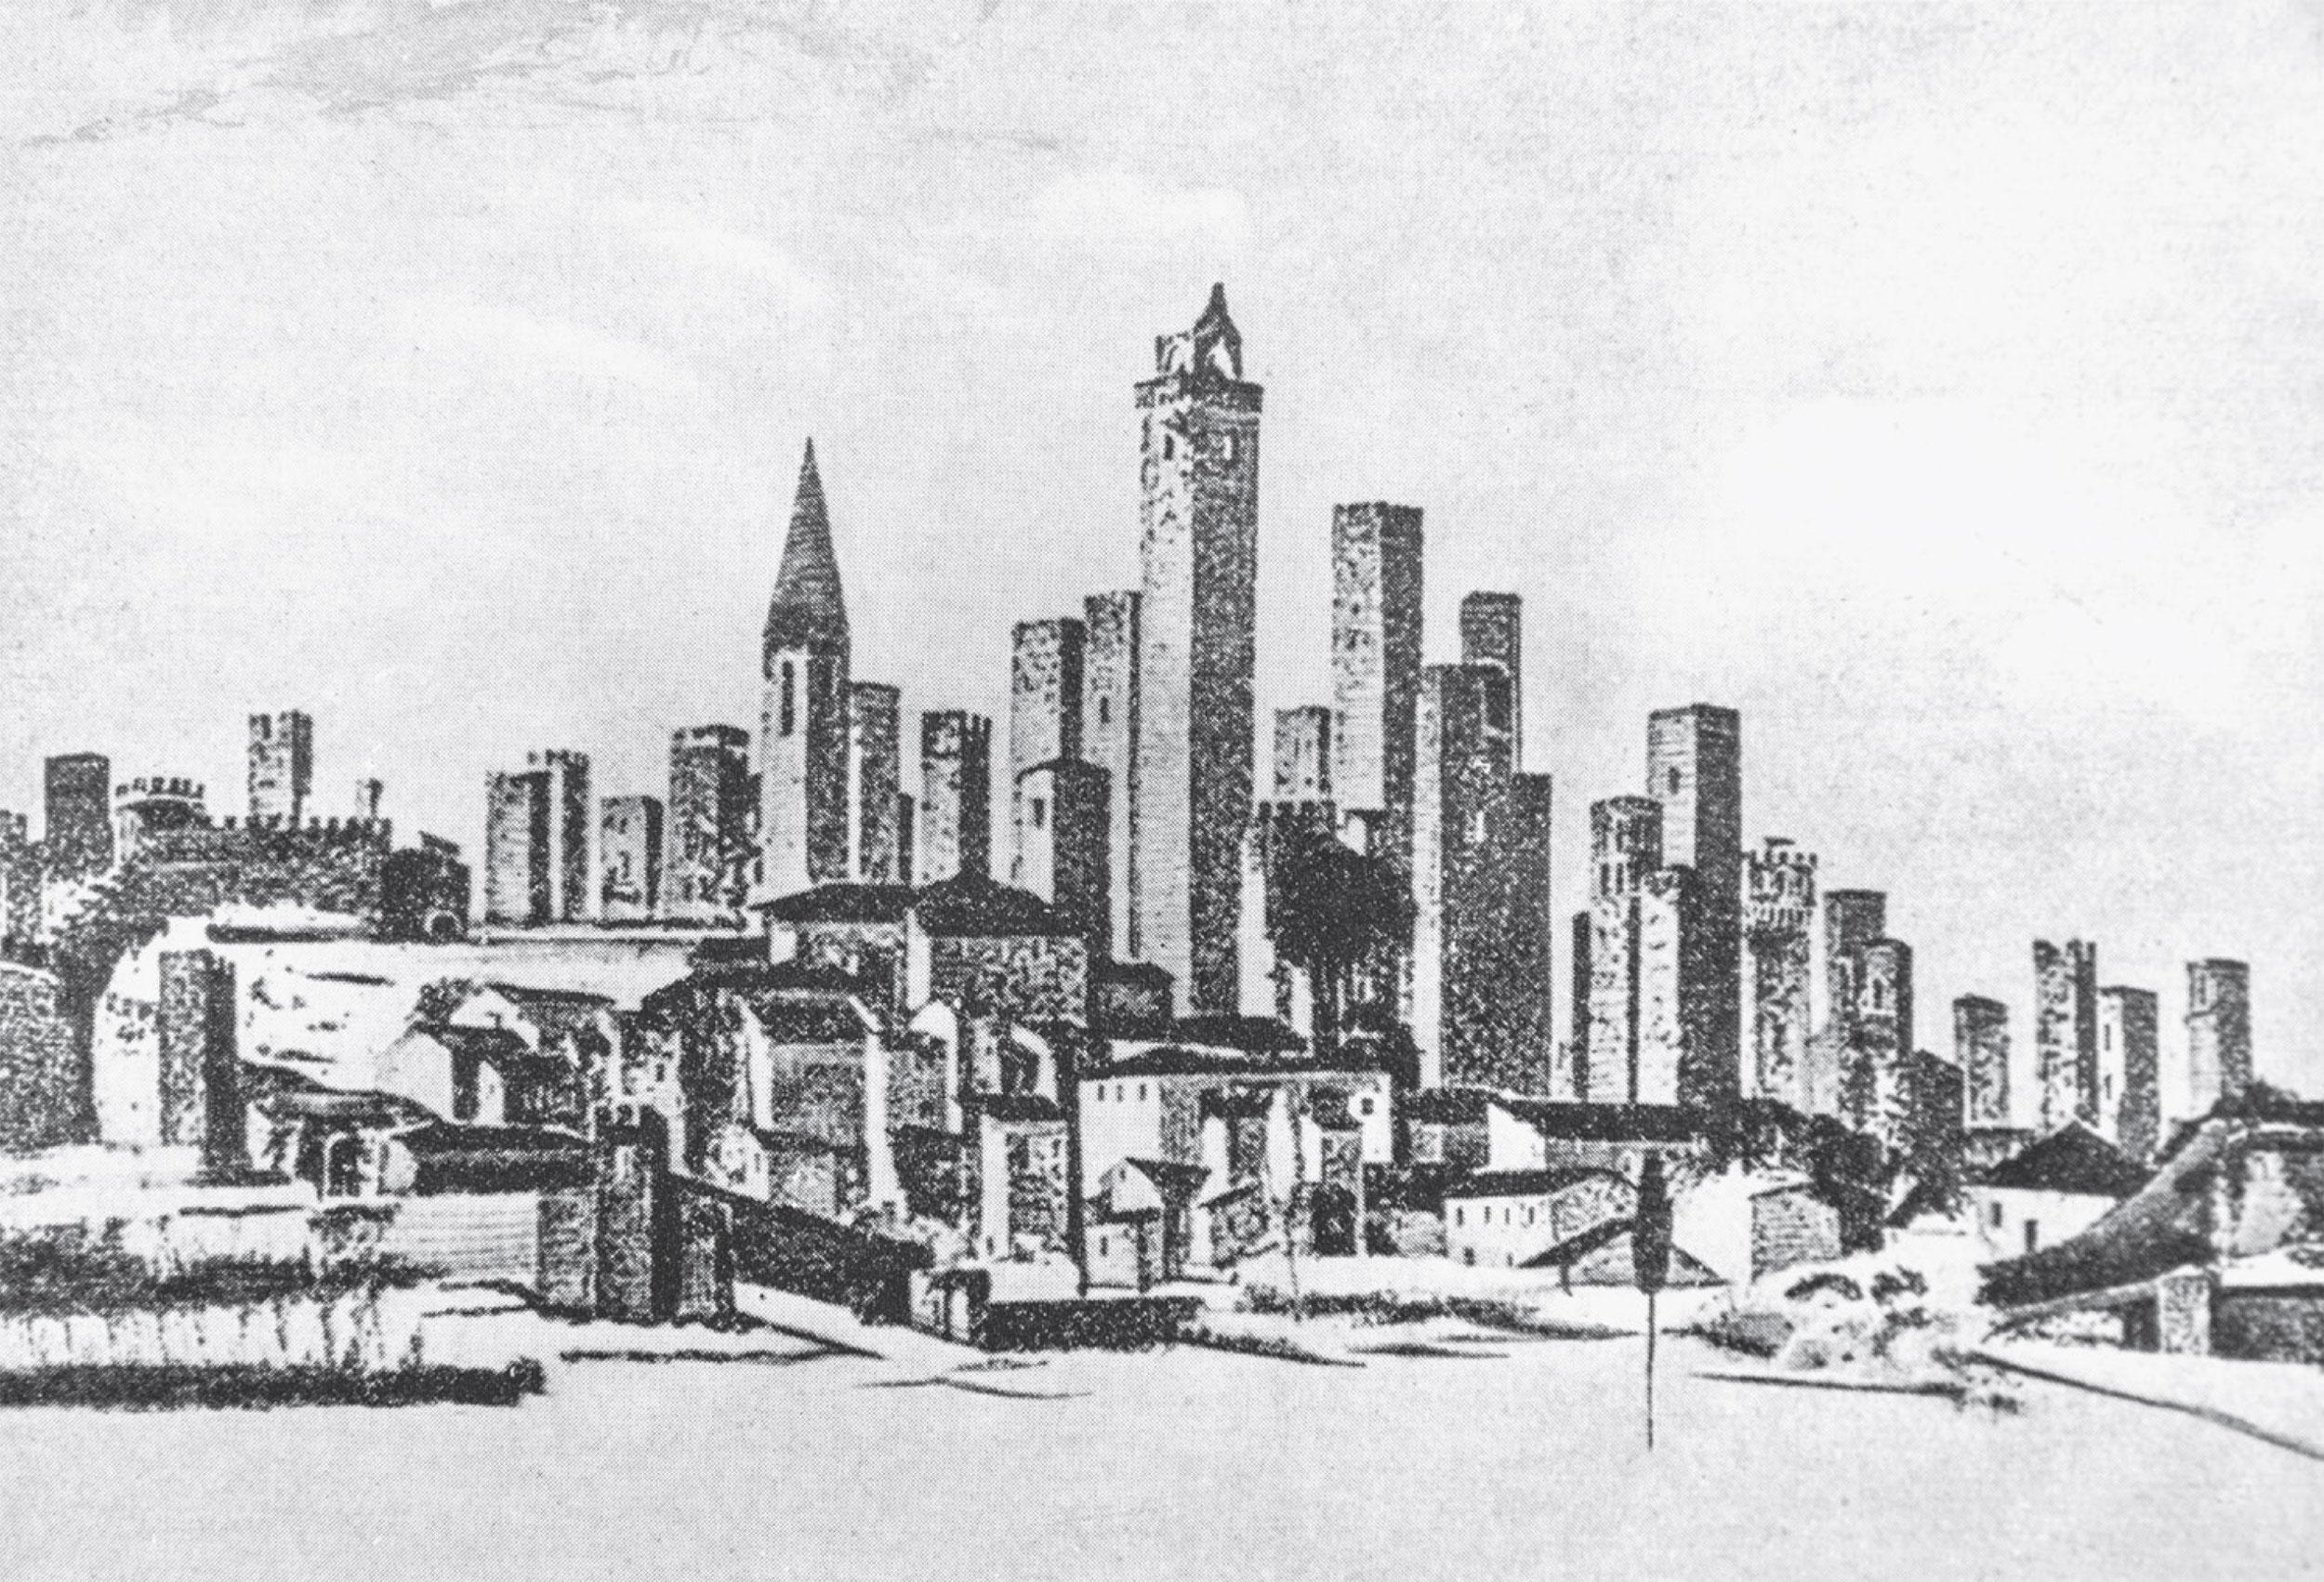 Sketch of San Gimignano